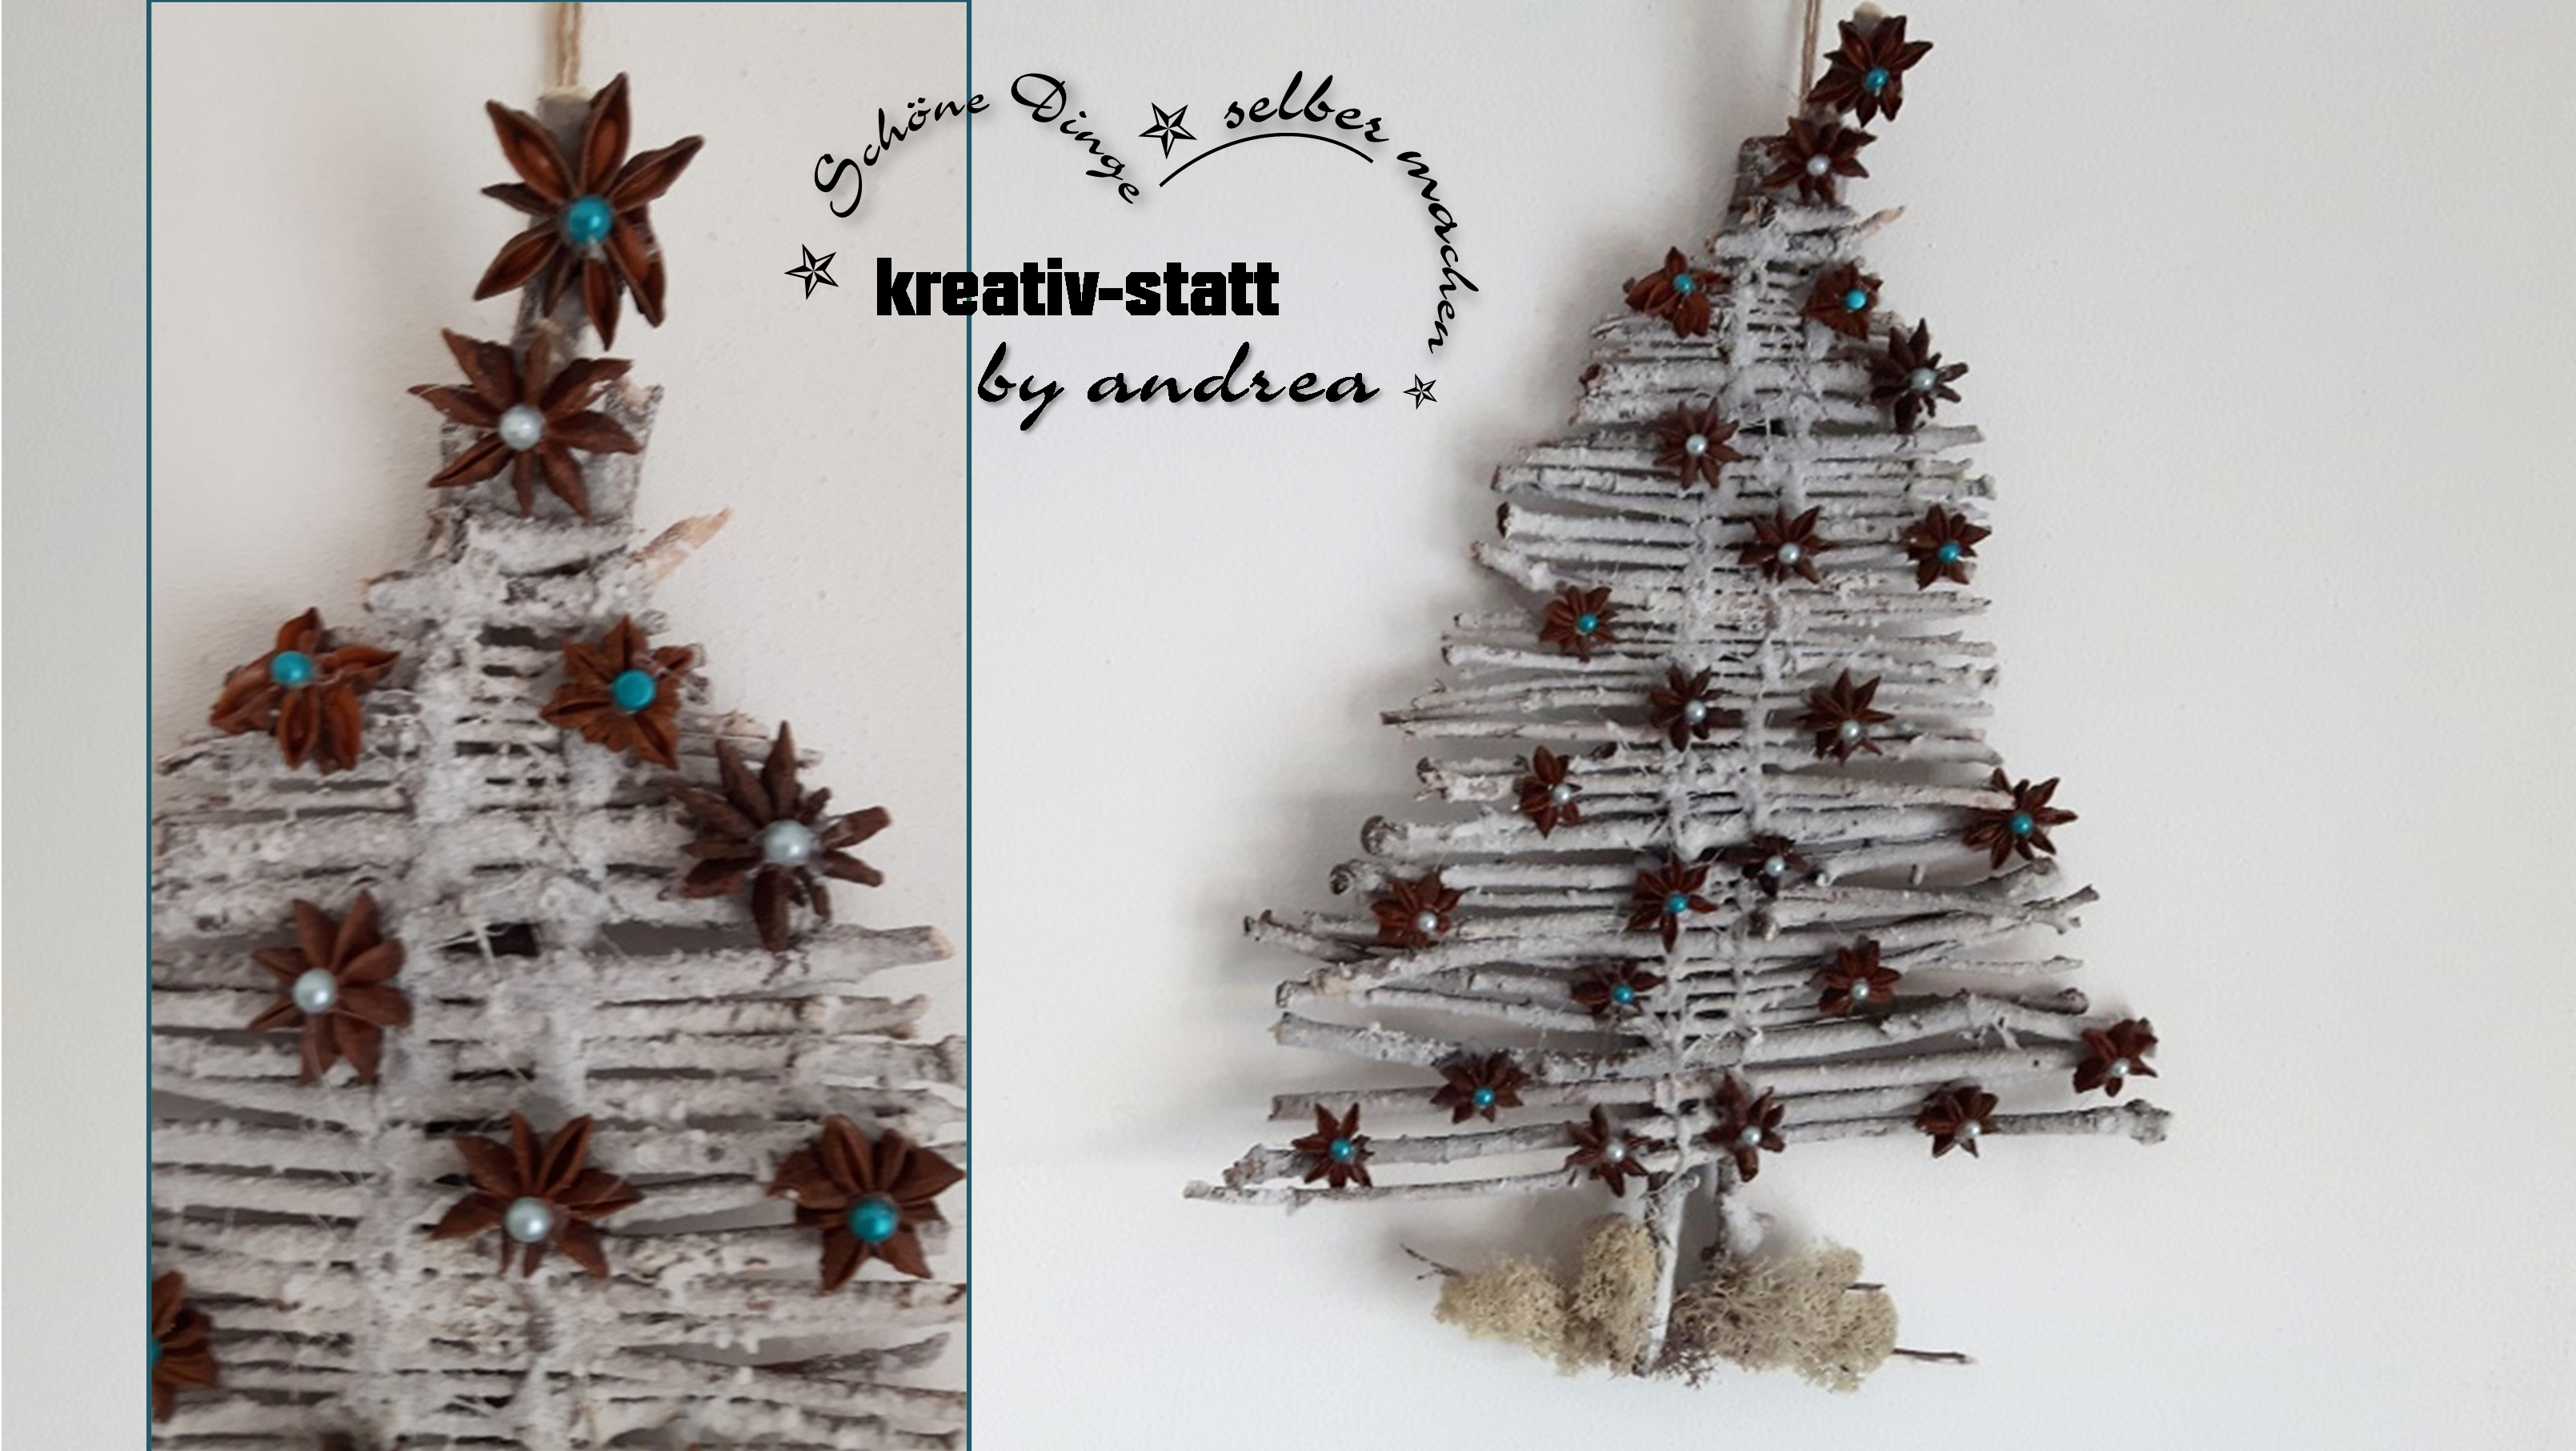 blog-kreativ-statt-andrea-diy-deko-idee-tannenbaum-holz-sternanis-weihnachten-diy-idee-decoration-wood-christmas-star-anis-pinetree-kstatta_03